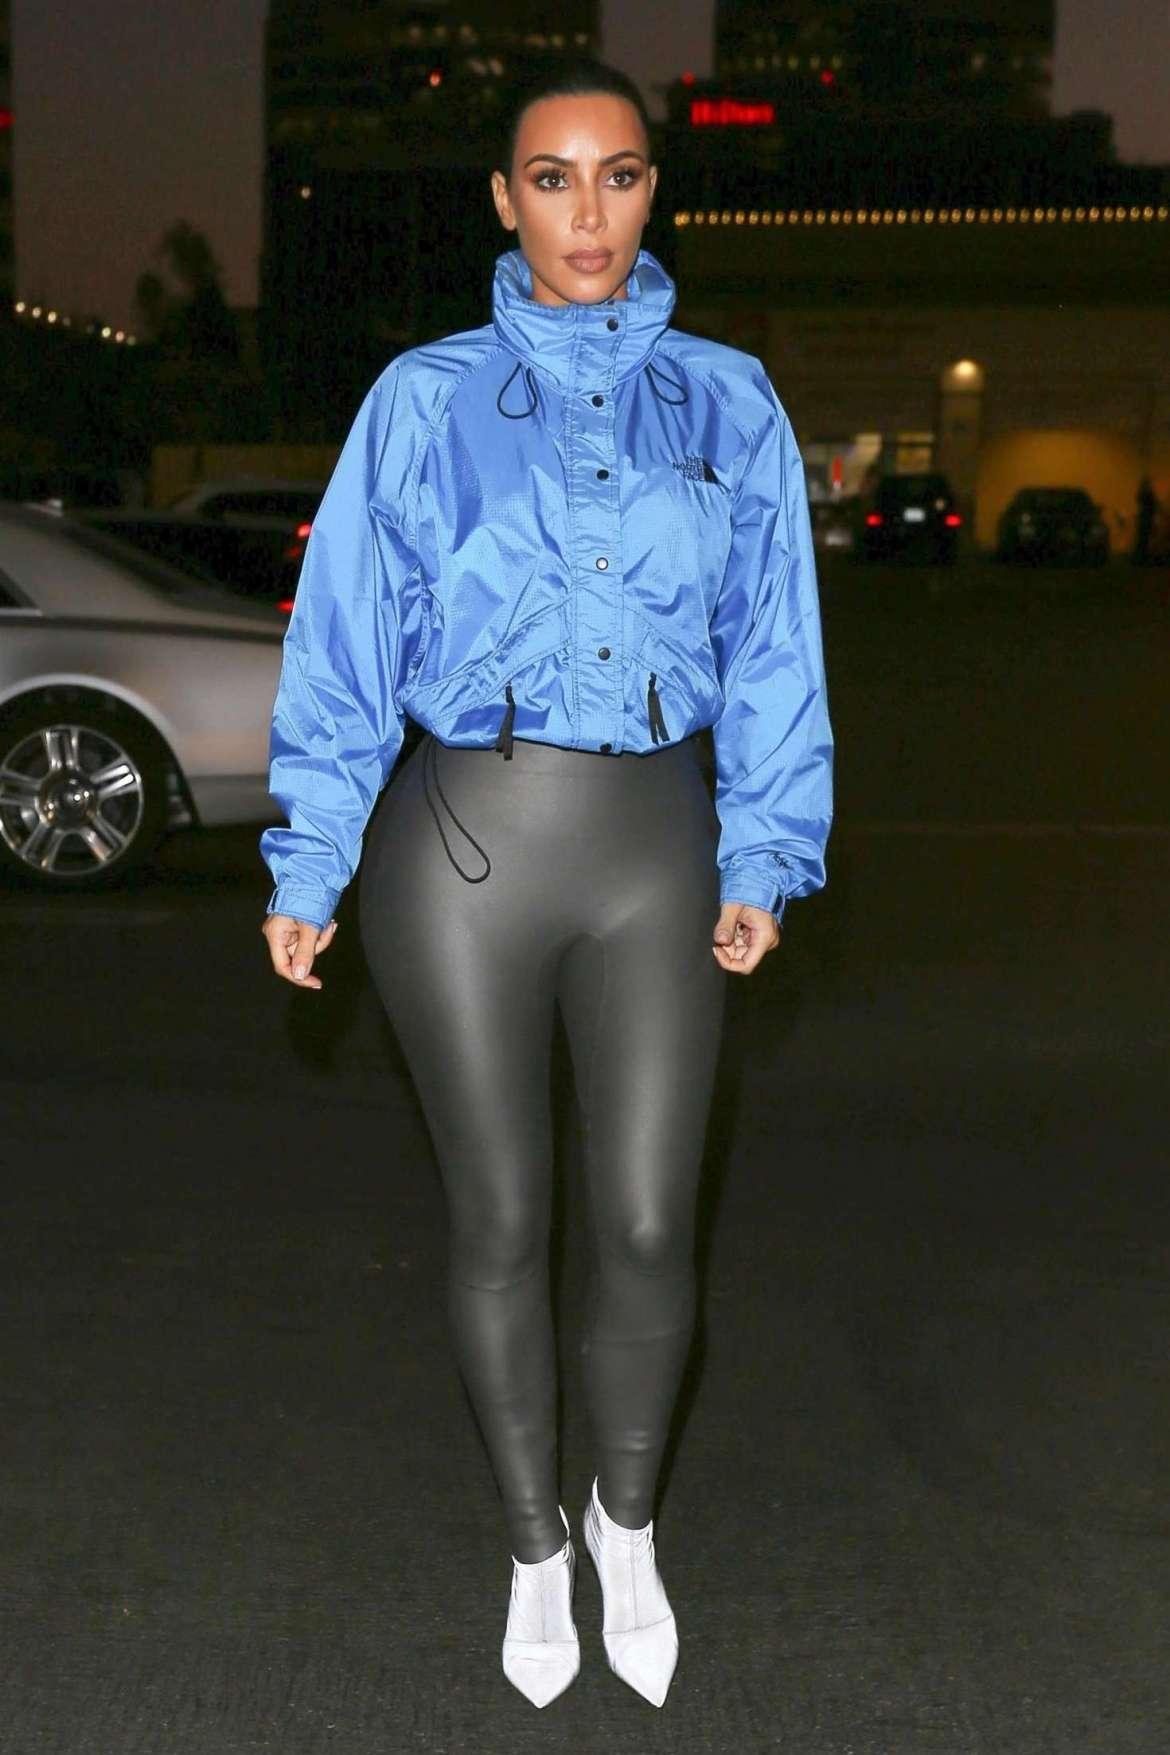 Kim Kardashian in Tight Pants at PetSmart store in Woodland Hills